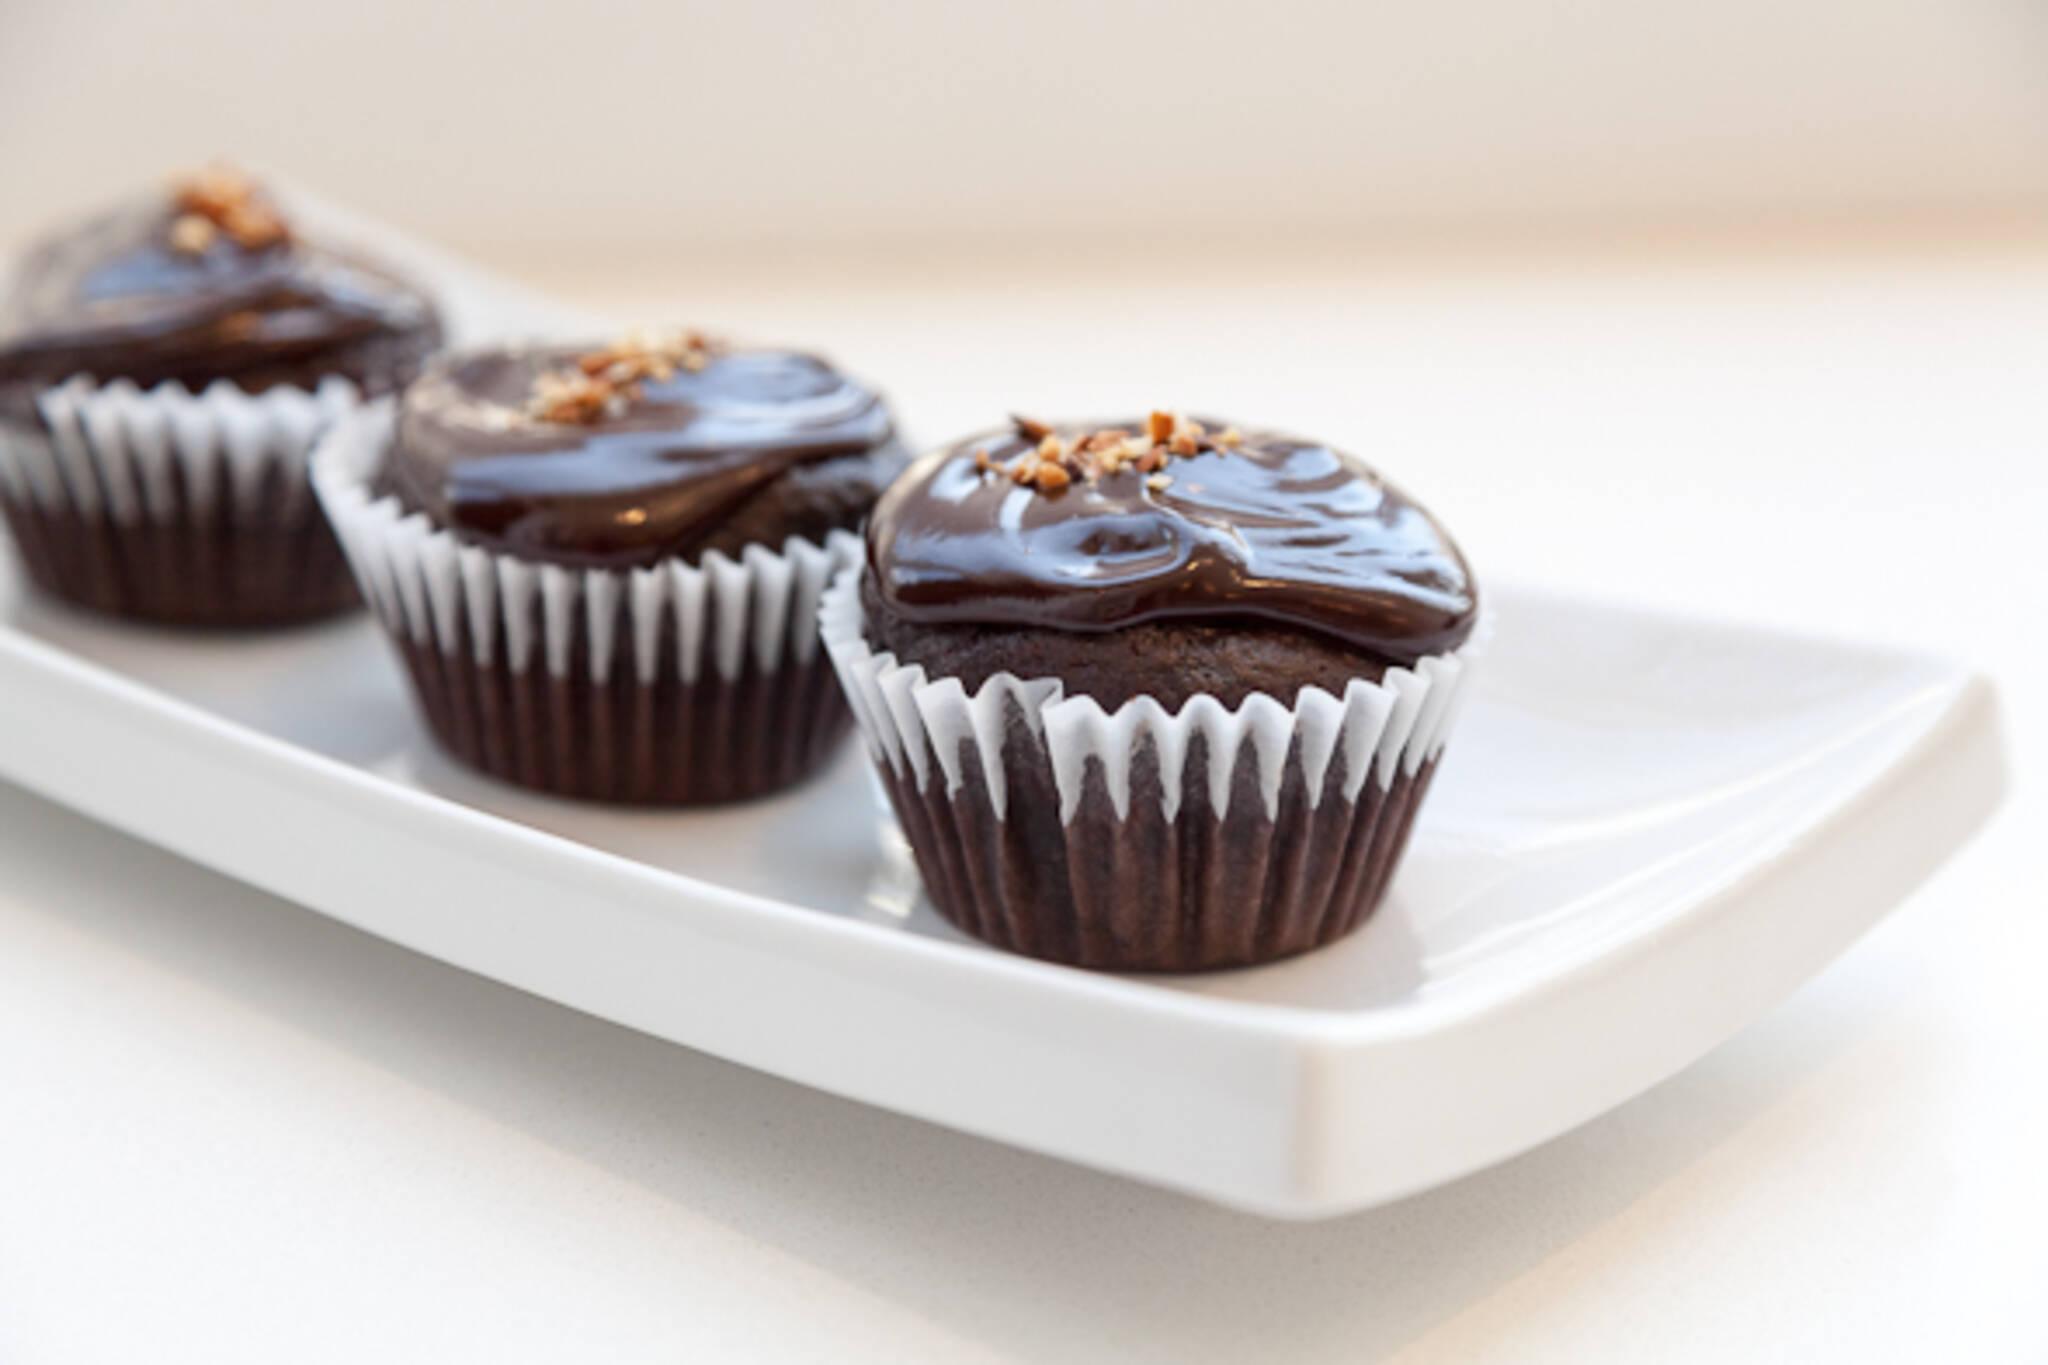 Chocolate Brunette Toronto